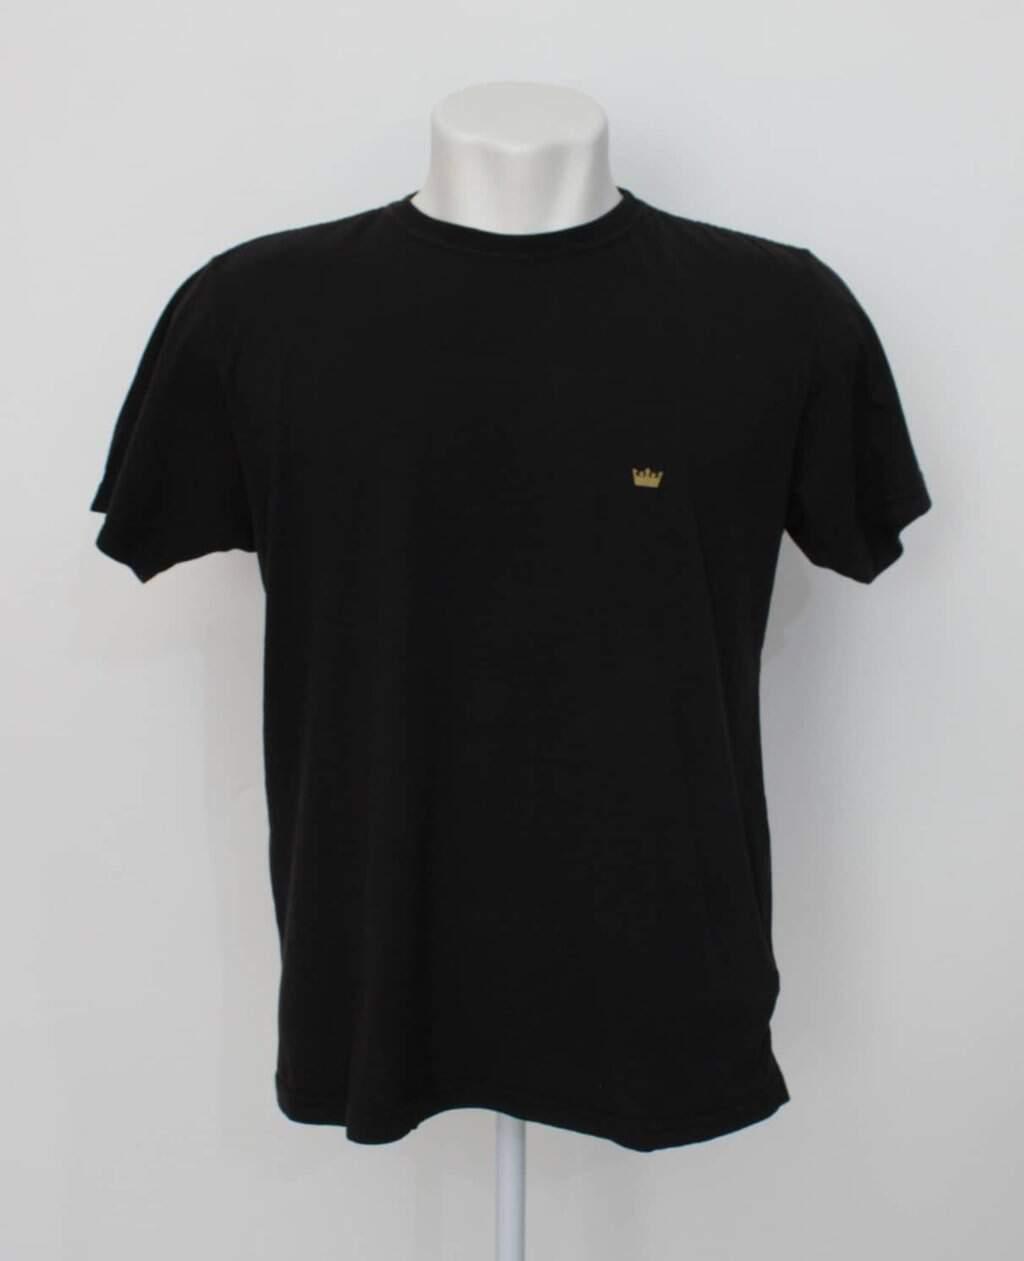 Camiseta masculina preta osklen com estampa localizada